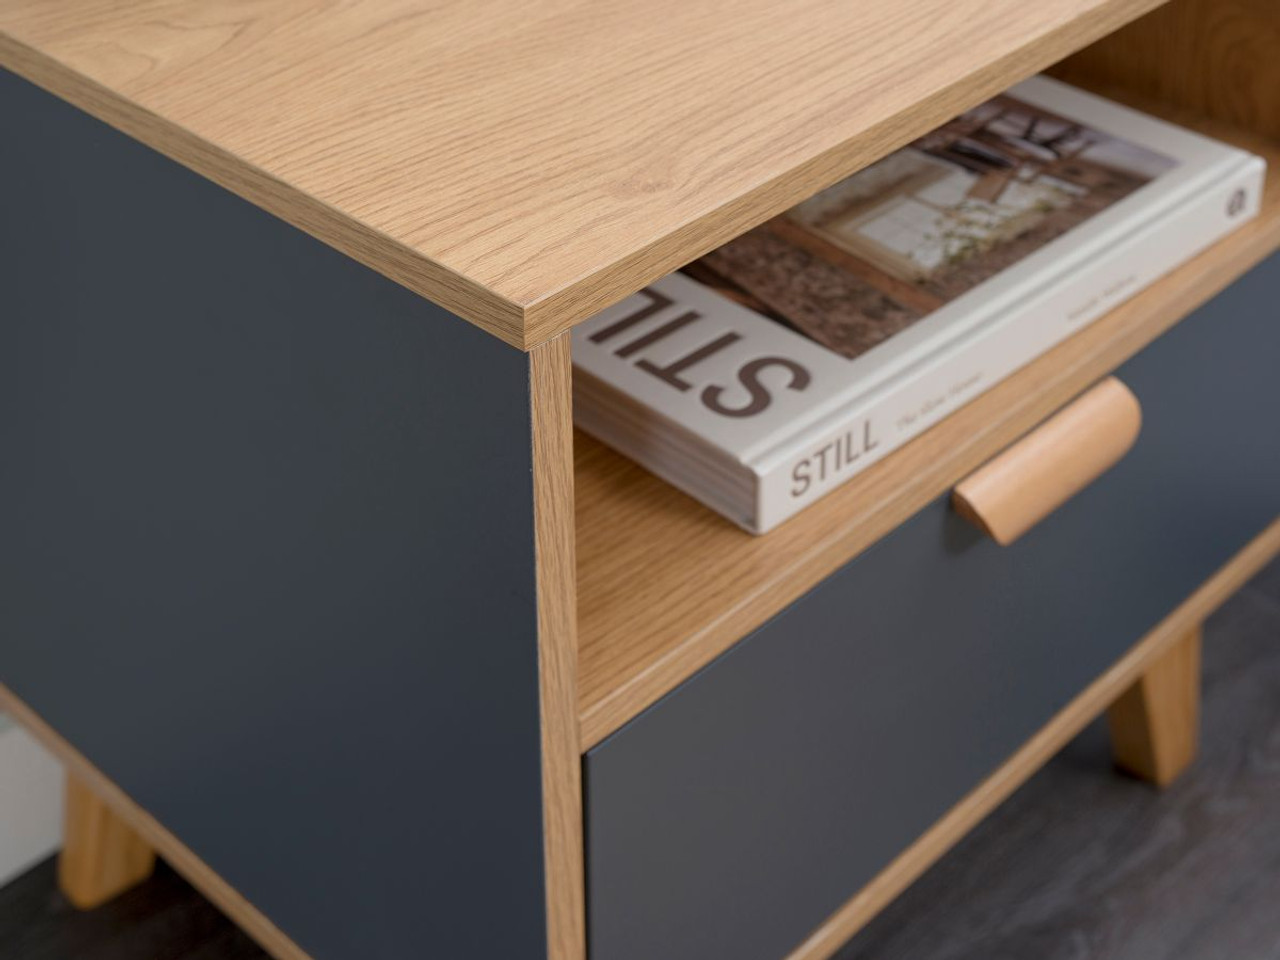 47+ Bedroom table mocka mockup info cpns terbaru